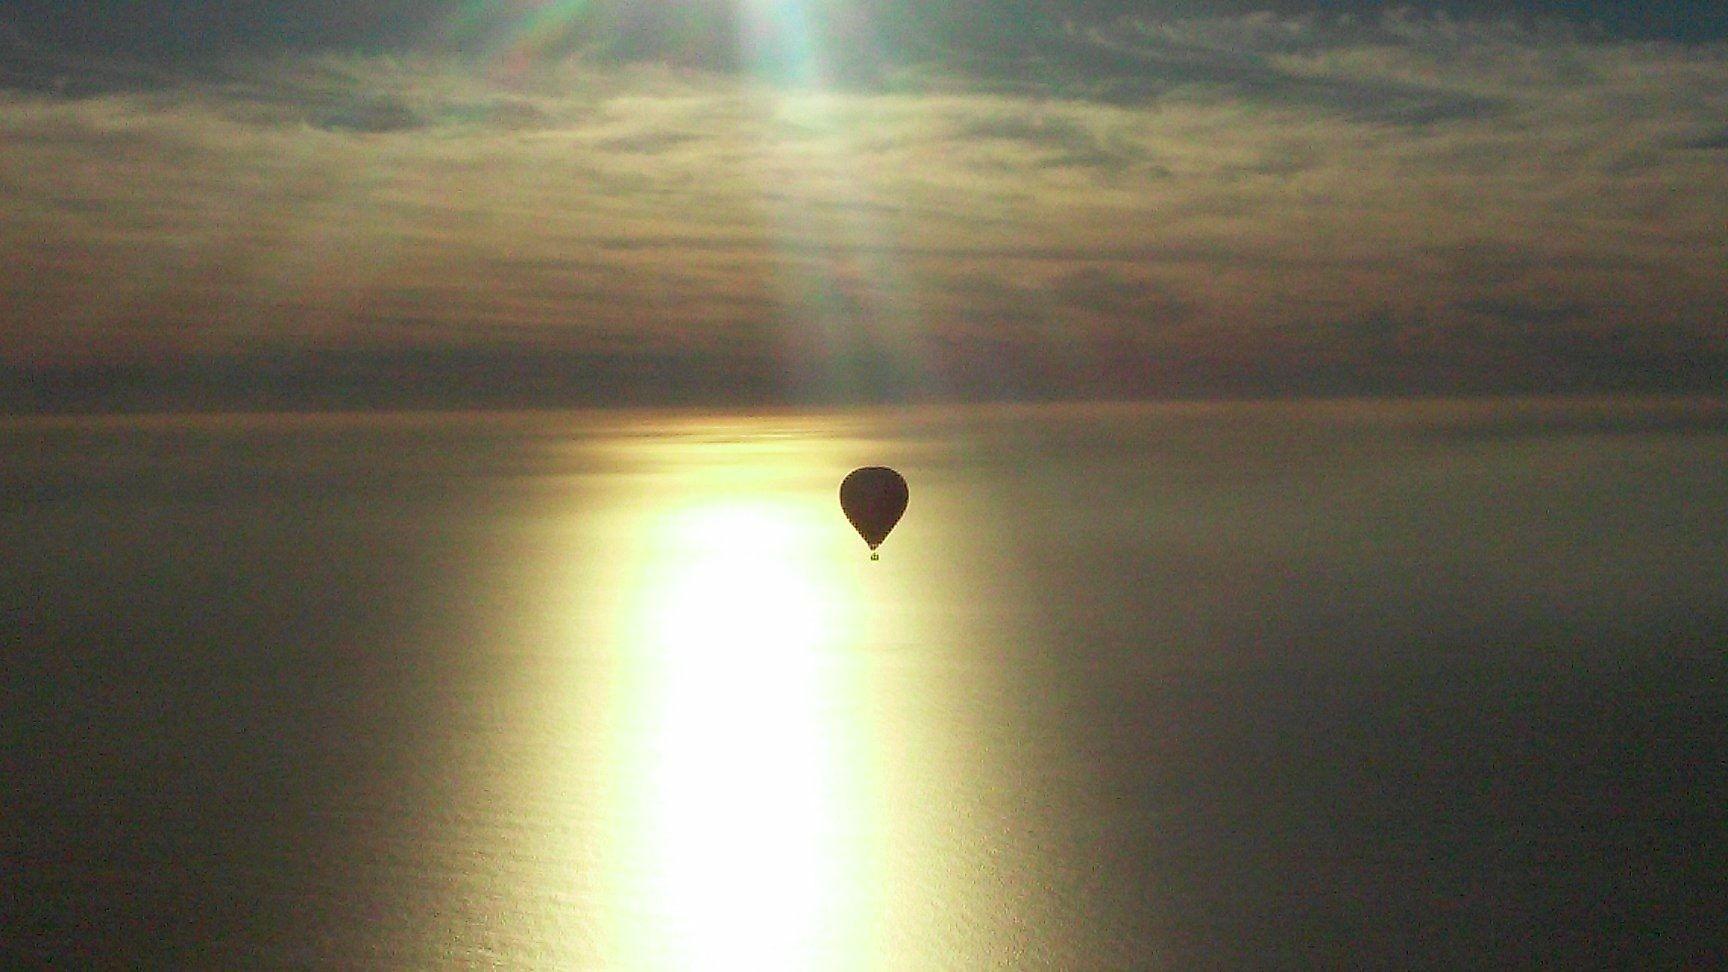 Sunset Hot Air Balloon Ride in Del Mar San Diego